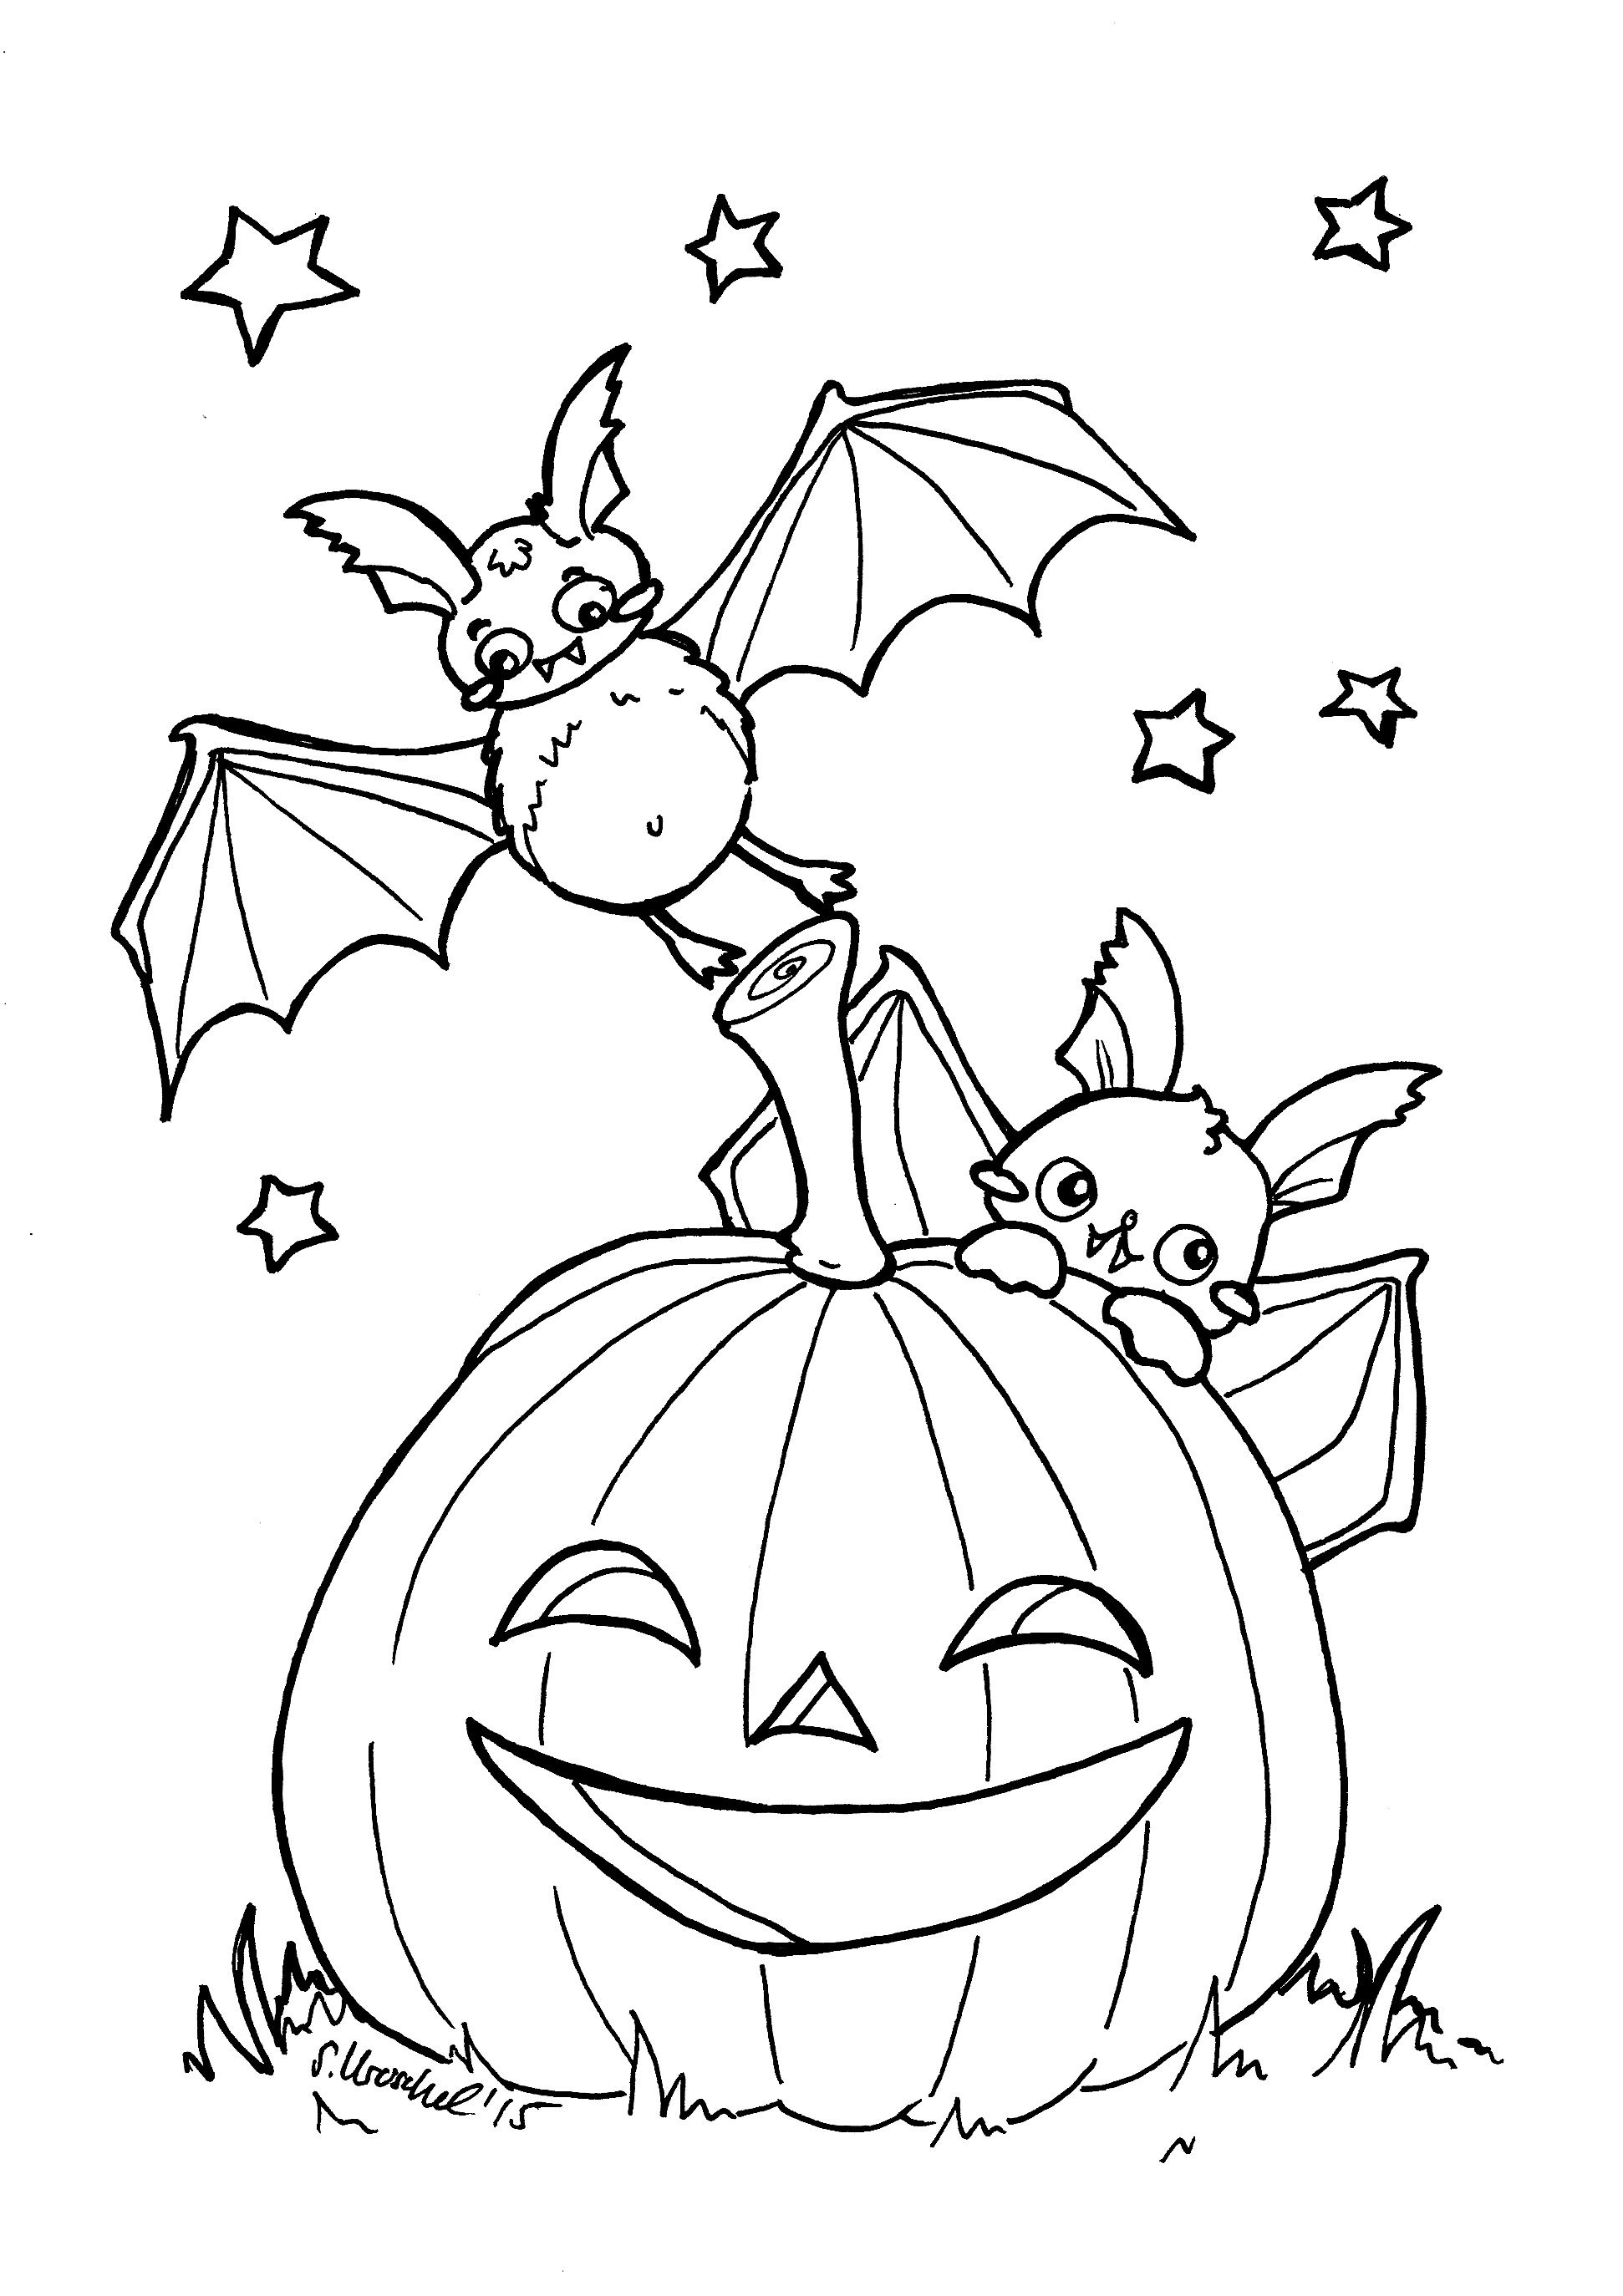 Ausmalbilder Oktober  Ausmalbilder, Halloween ausmalbilder